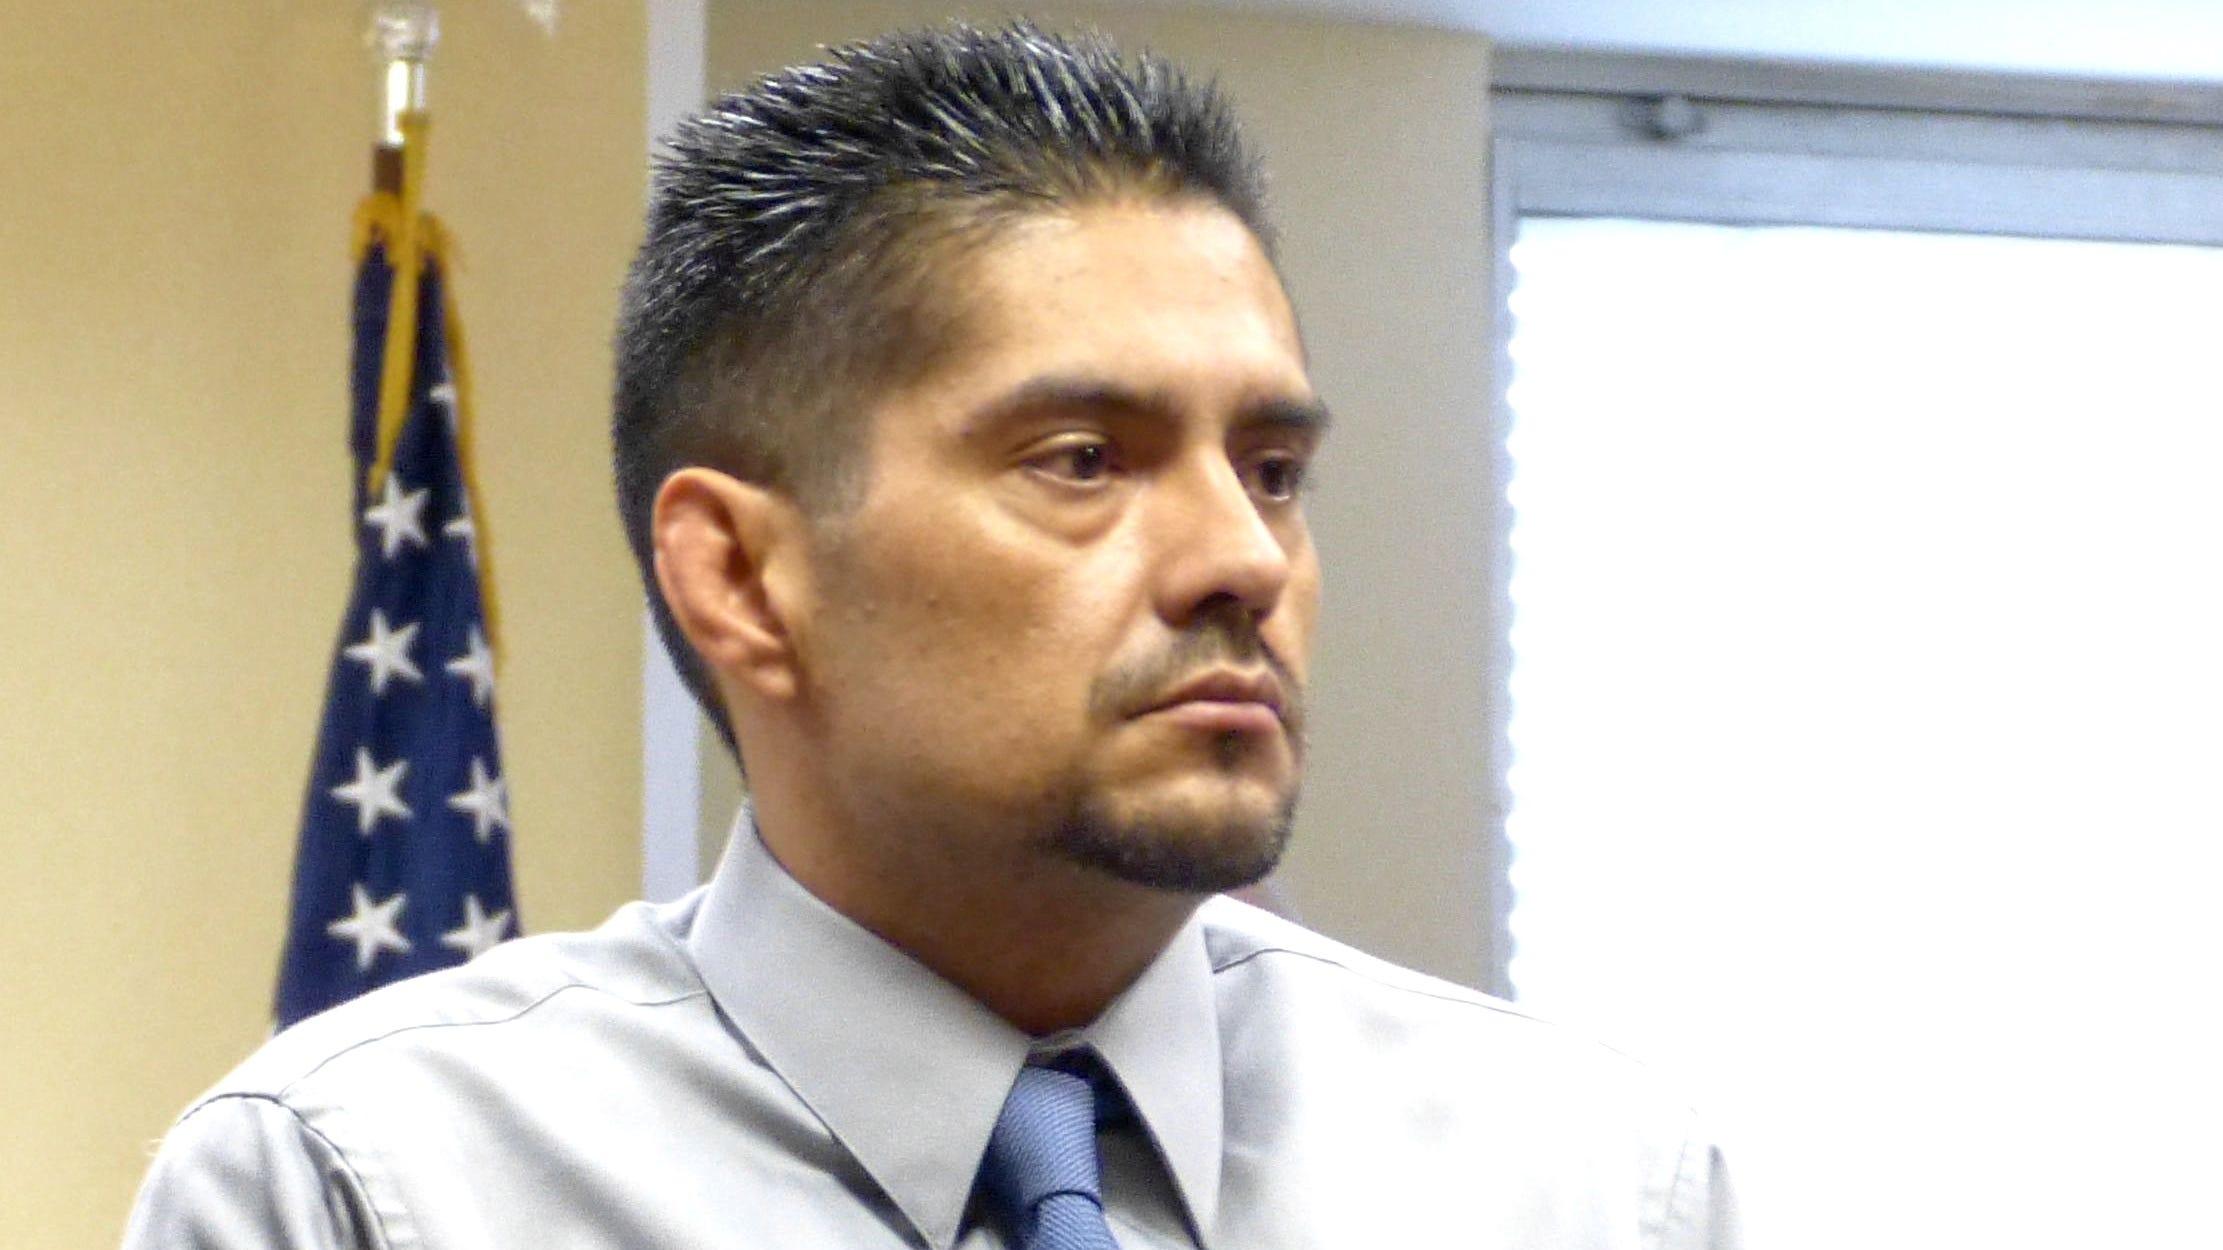 Juan Venegas appears in court in June 2017.